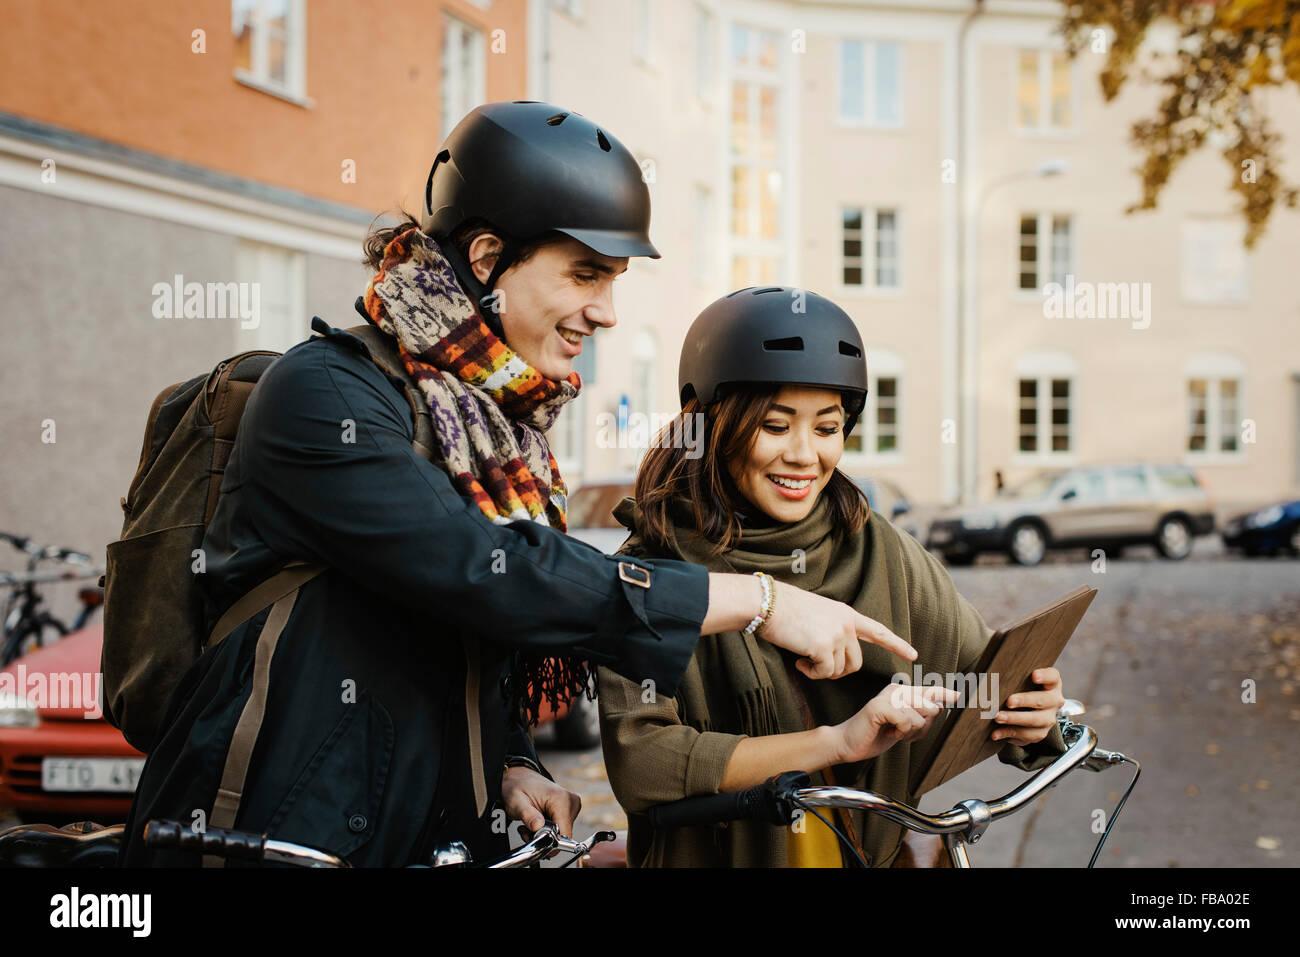 La Svezia, Uppland, Stoccolma, Vasastan, Rodabergsbrinken, due giovani guardando digitale compressa sorridente Foto Stock